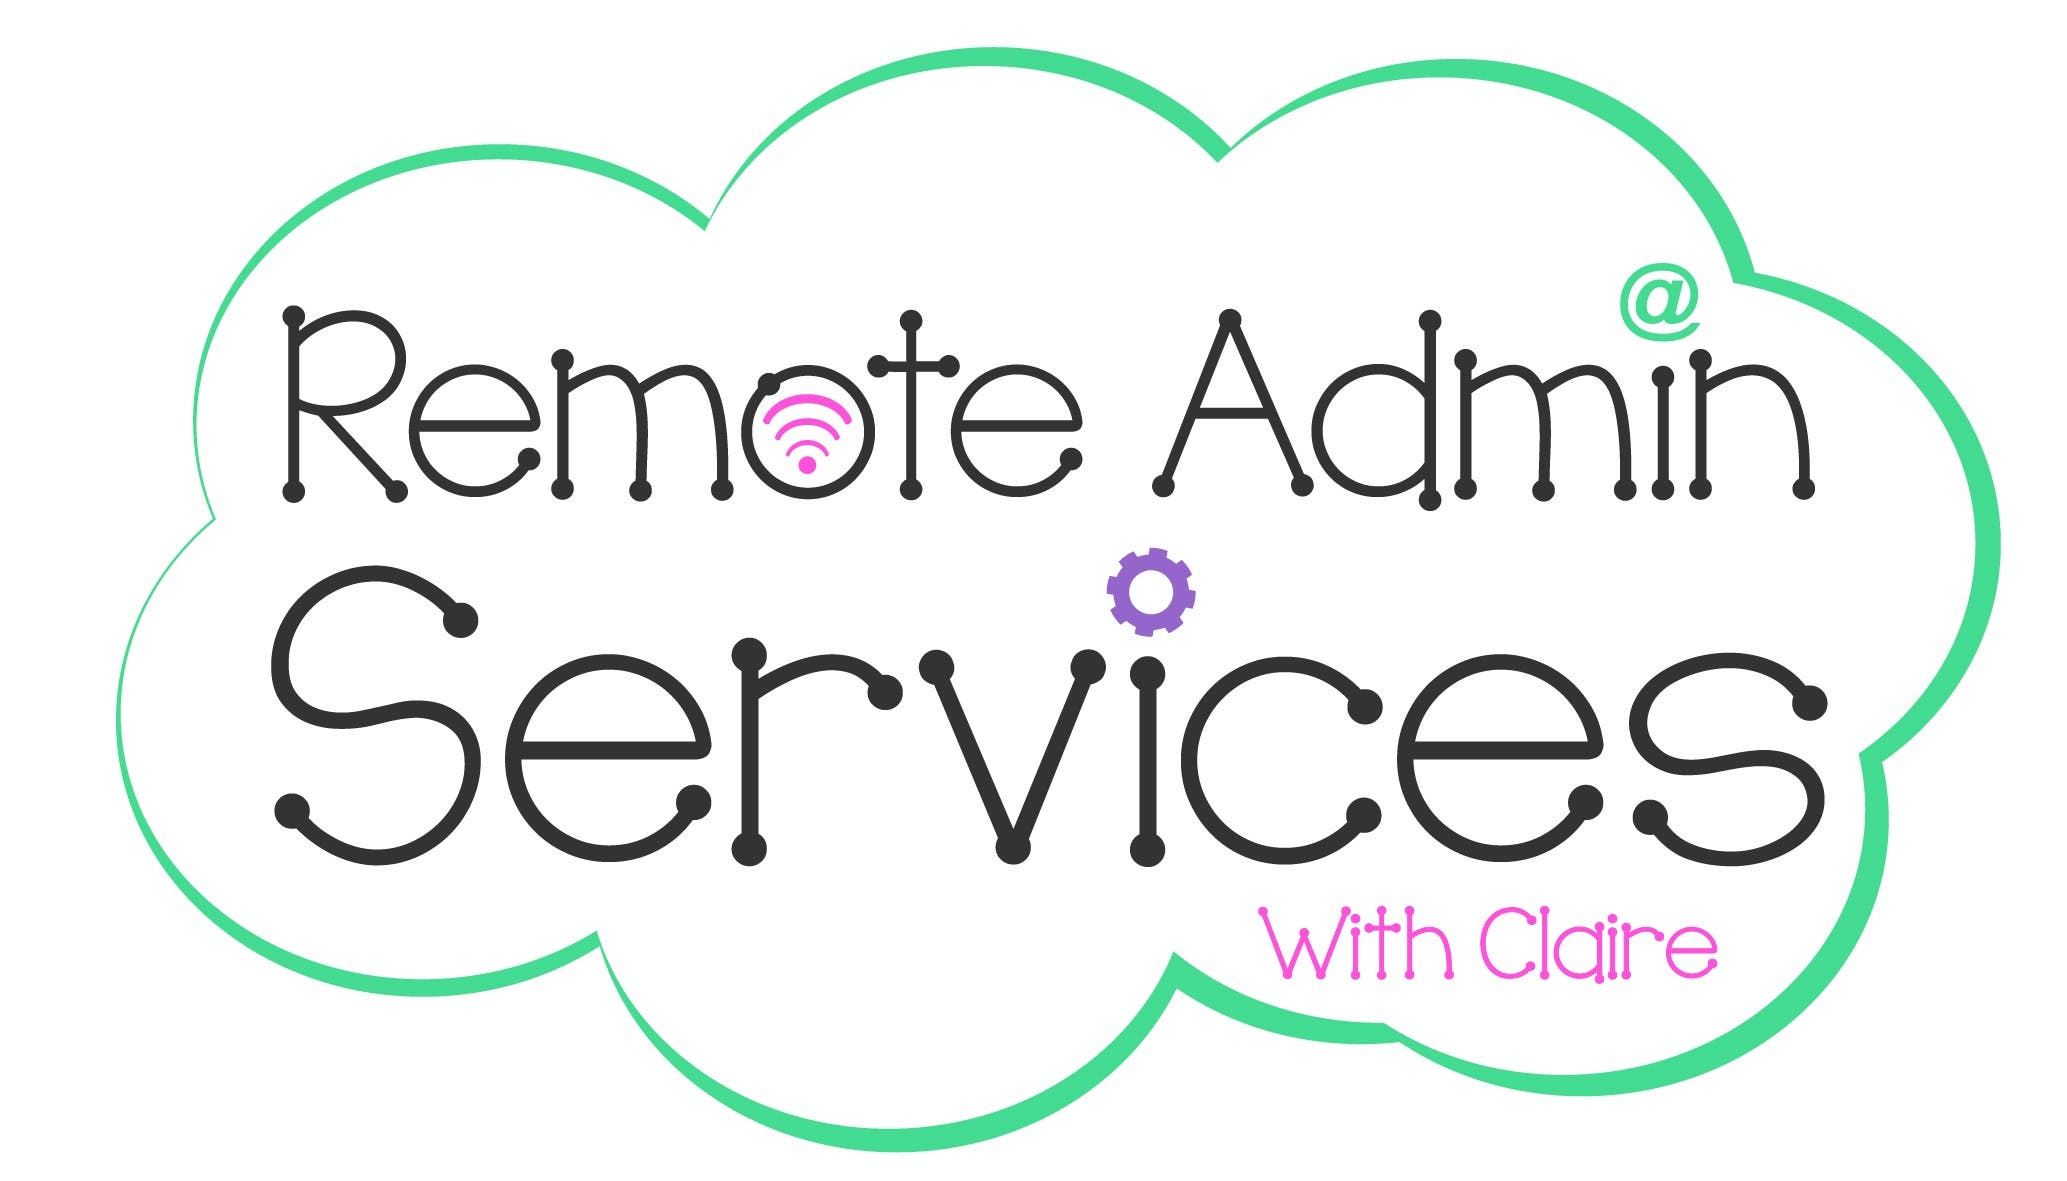 Remote Admin Services Training School